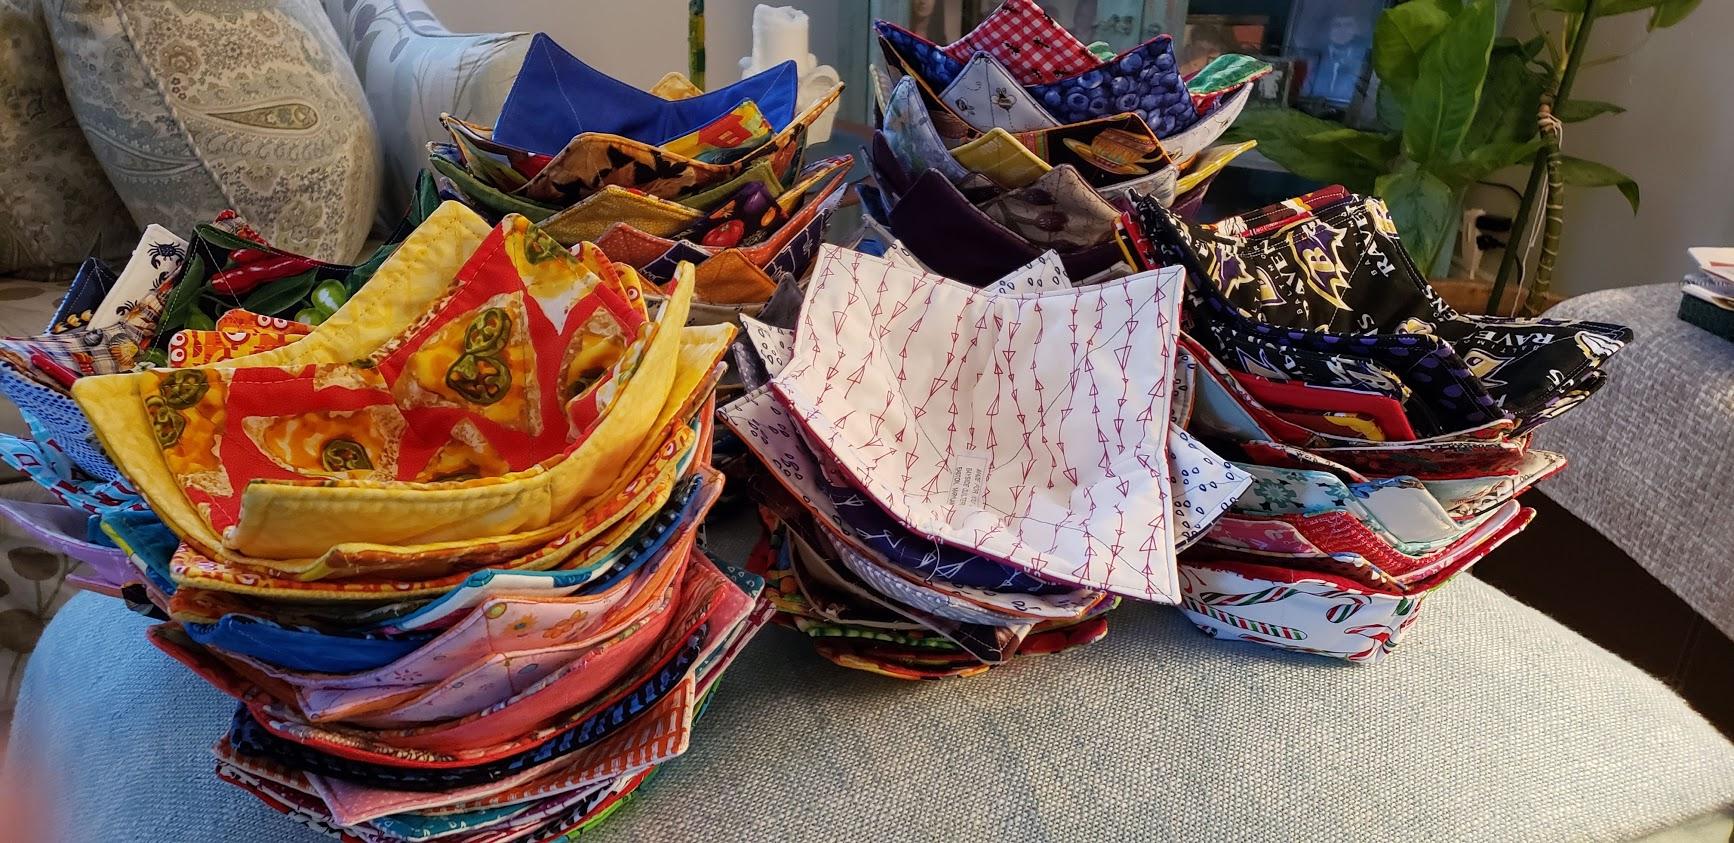 stacks of bowl cozies